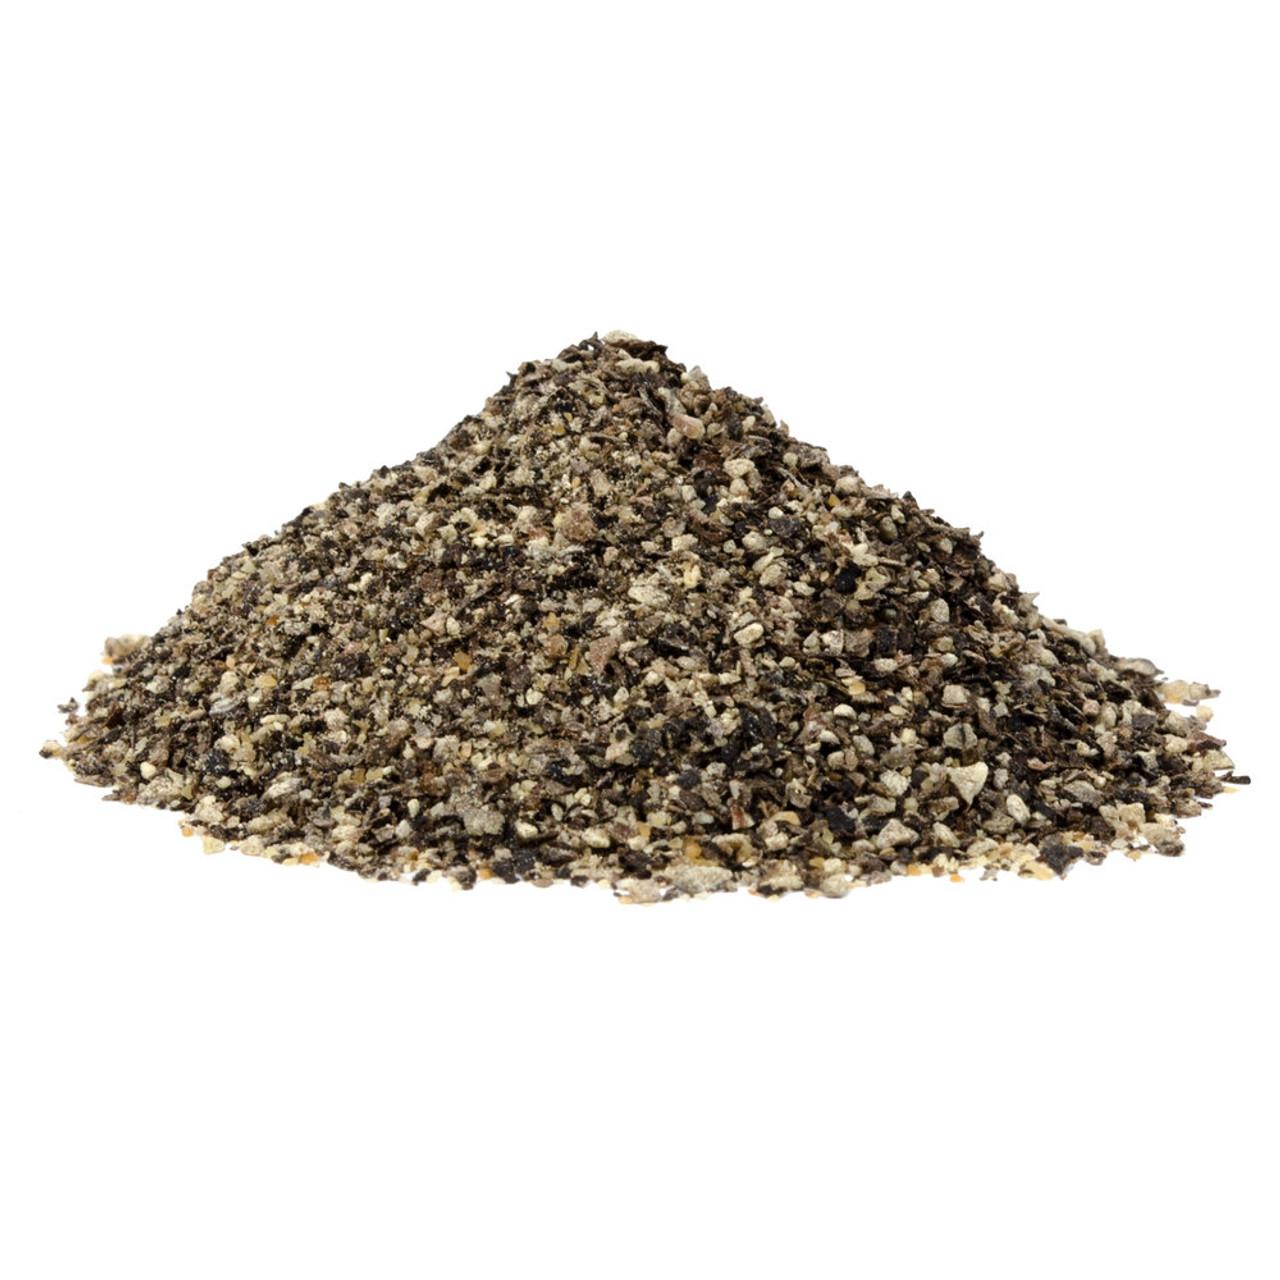 Peppercorns Black Coarse Ground 500g